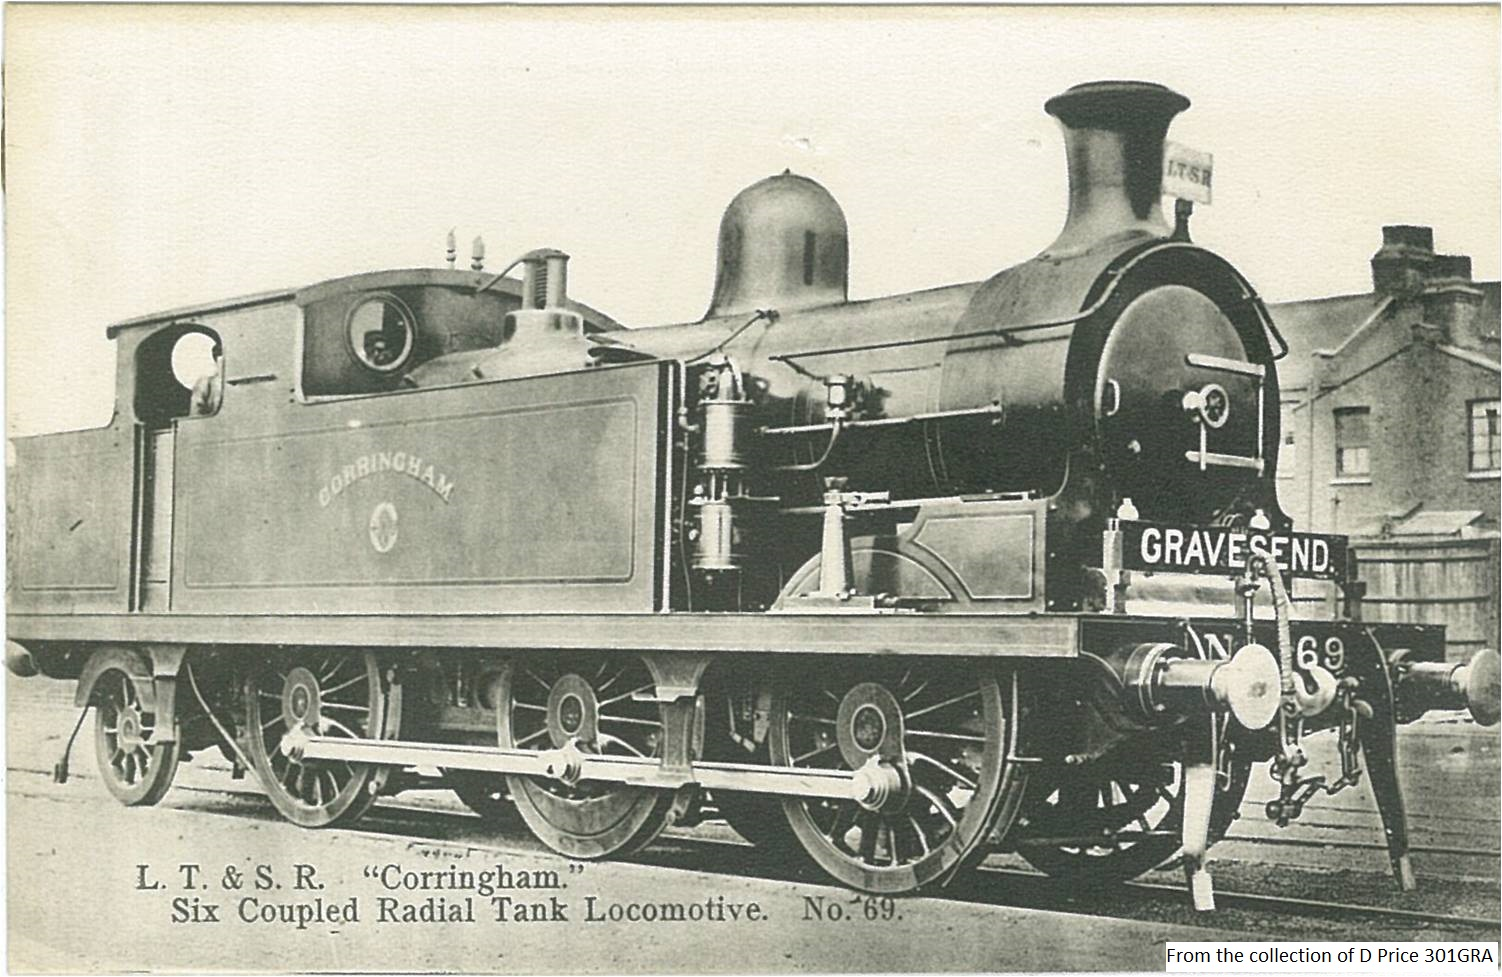 301gra-a-gravesend-train